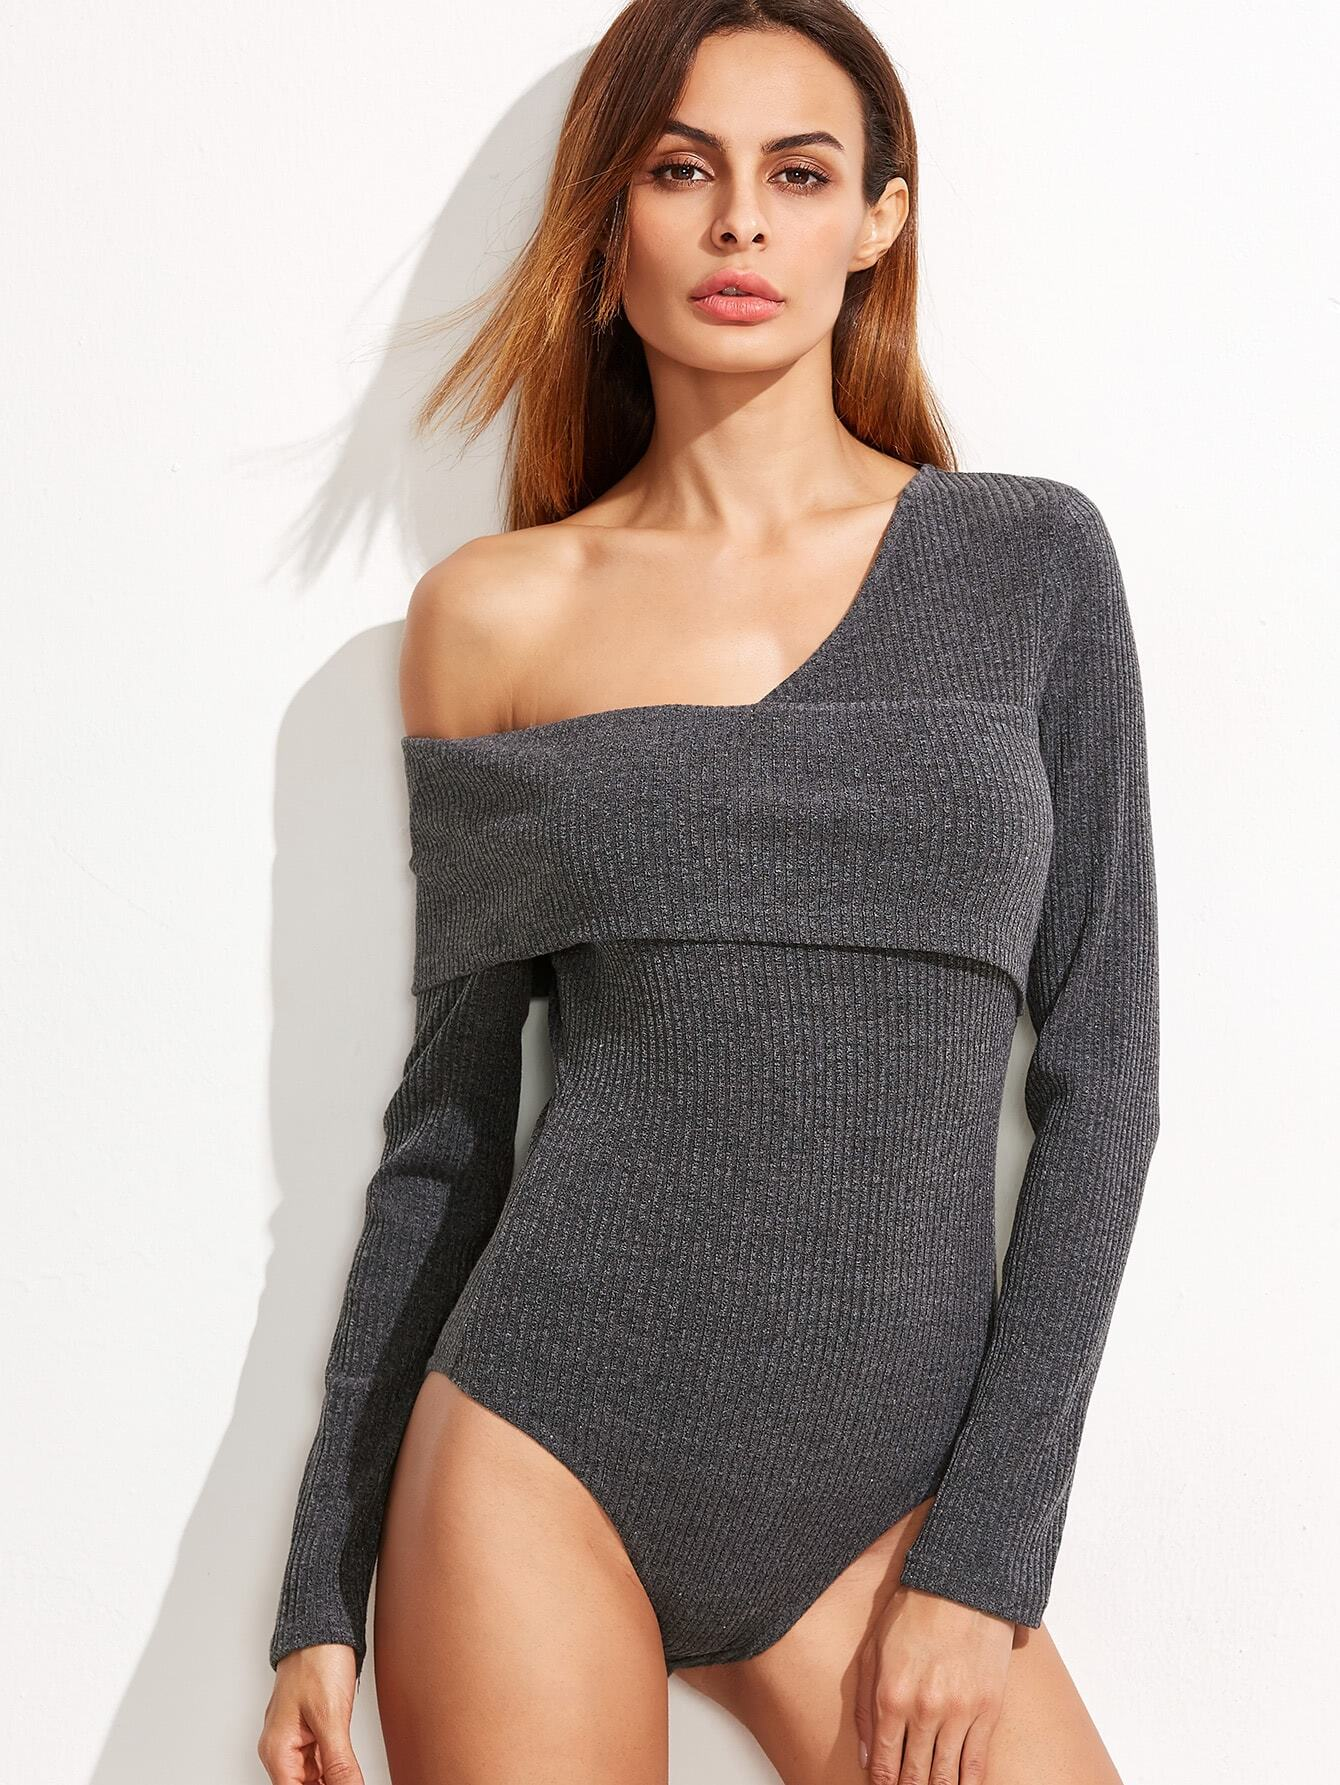 Grey Ribbed Knit Asymmetric Fold Off The Shoulder Bodysuit bodysuit161129701